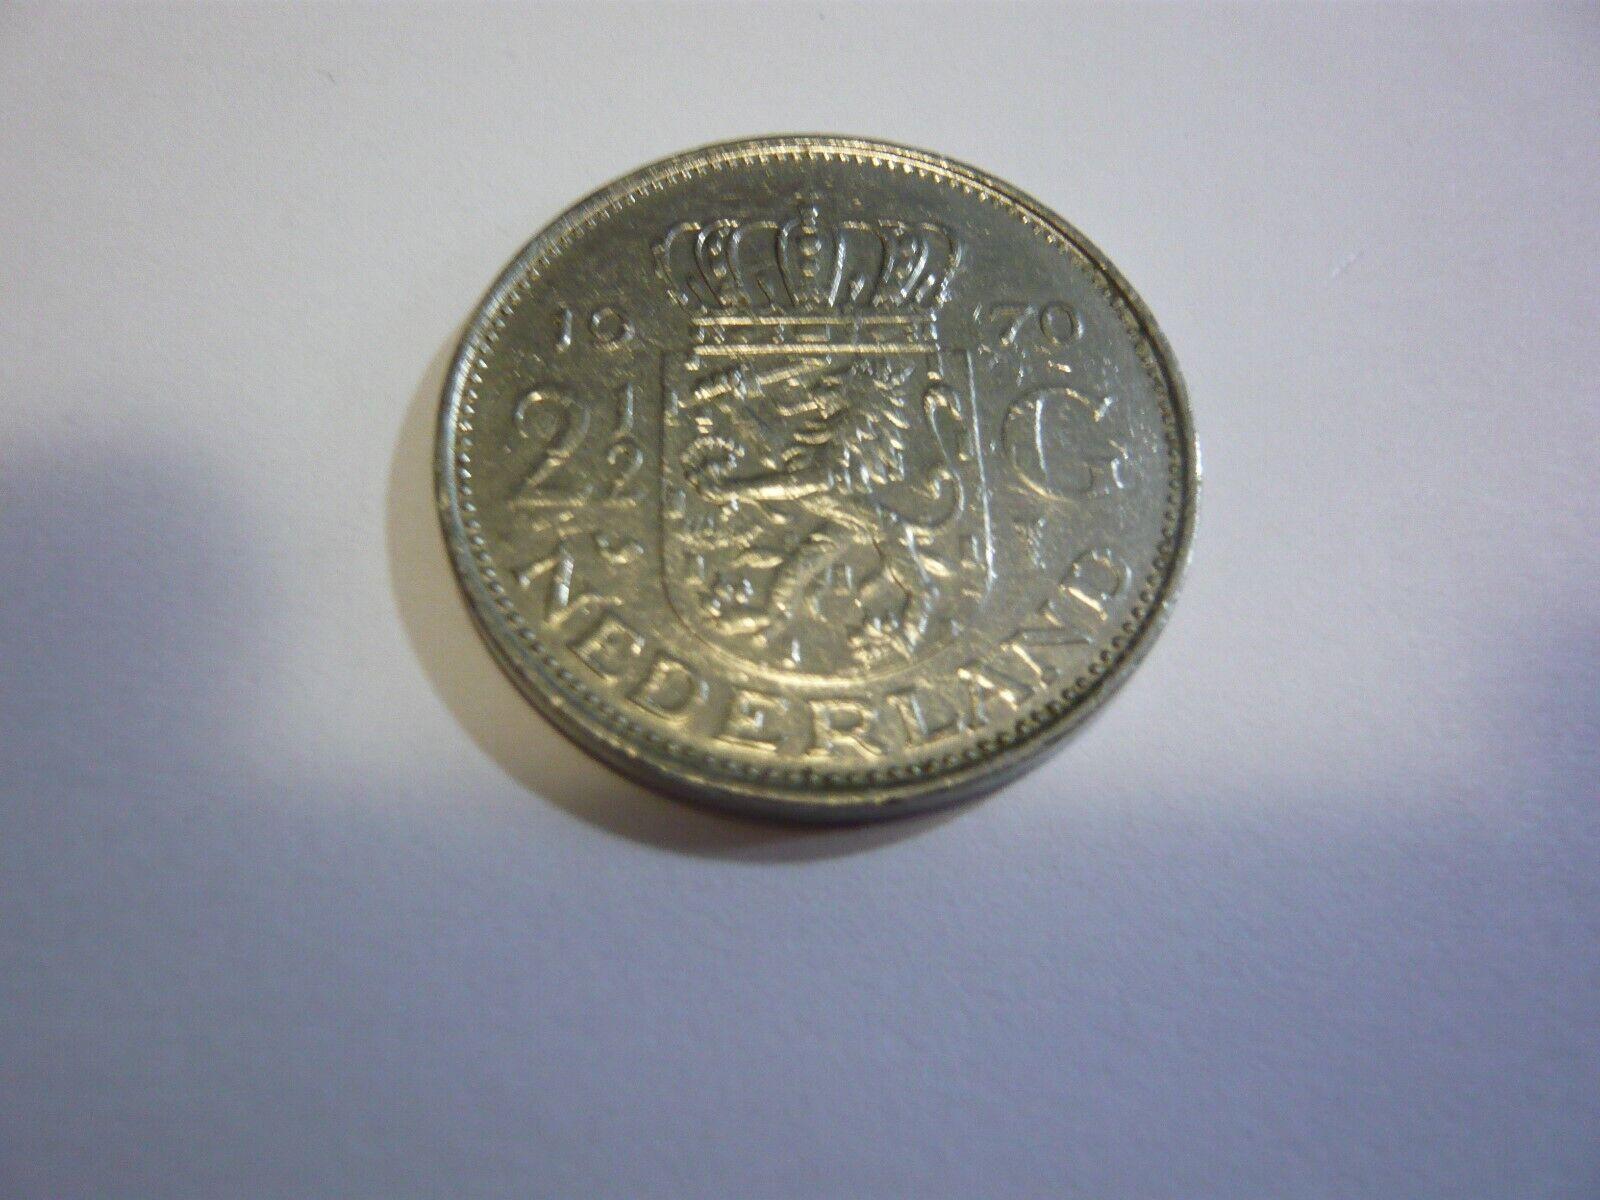 2 1/2 Gulden Netherlands coin Pays-Bas pièce  1970